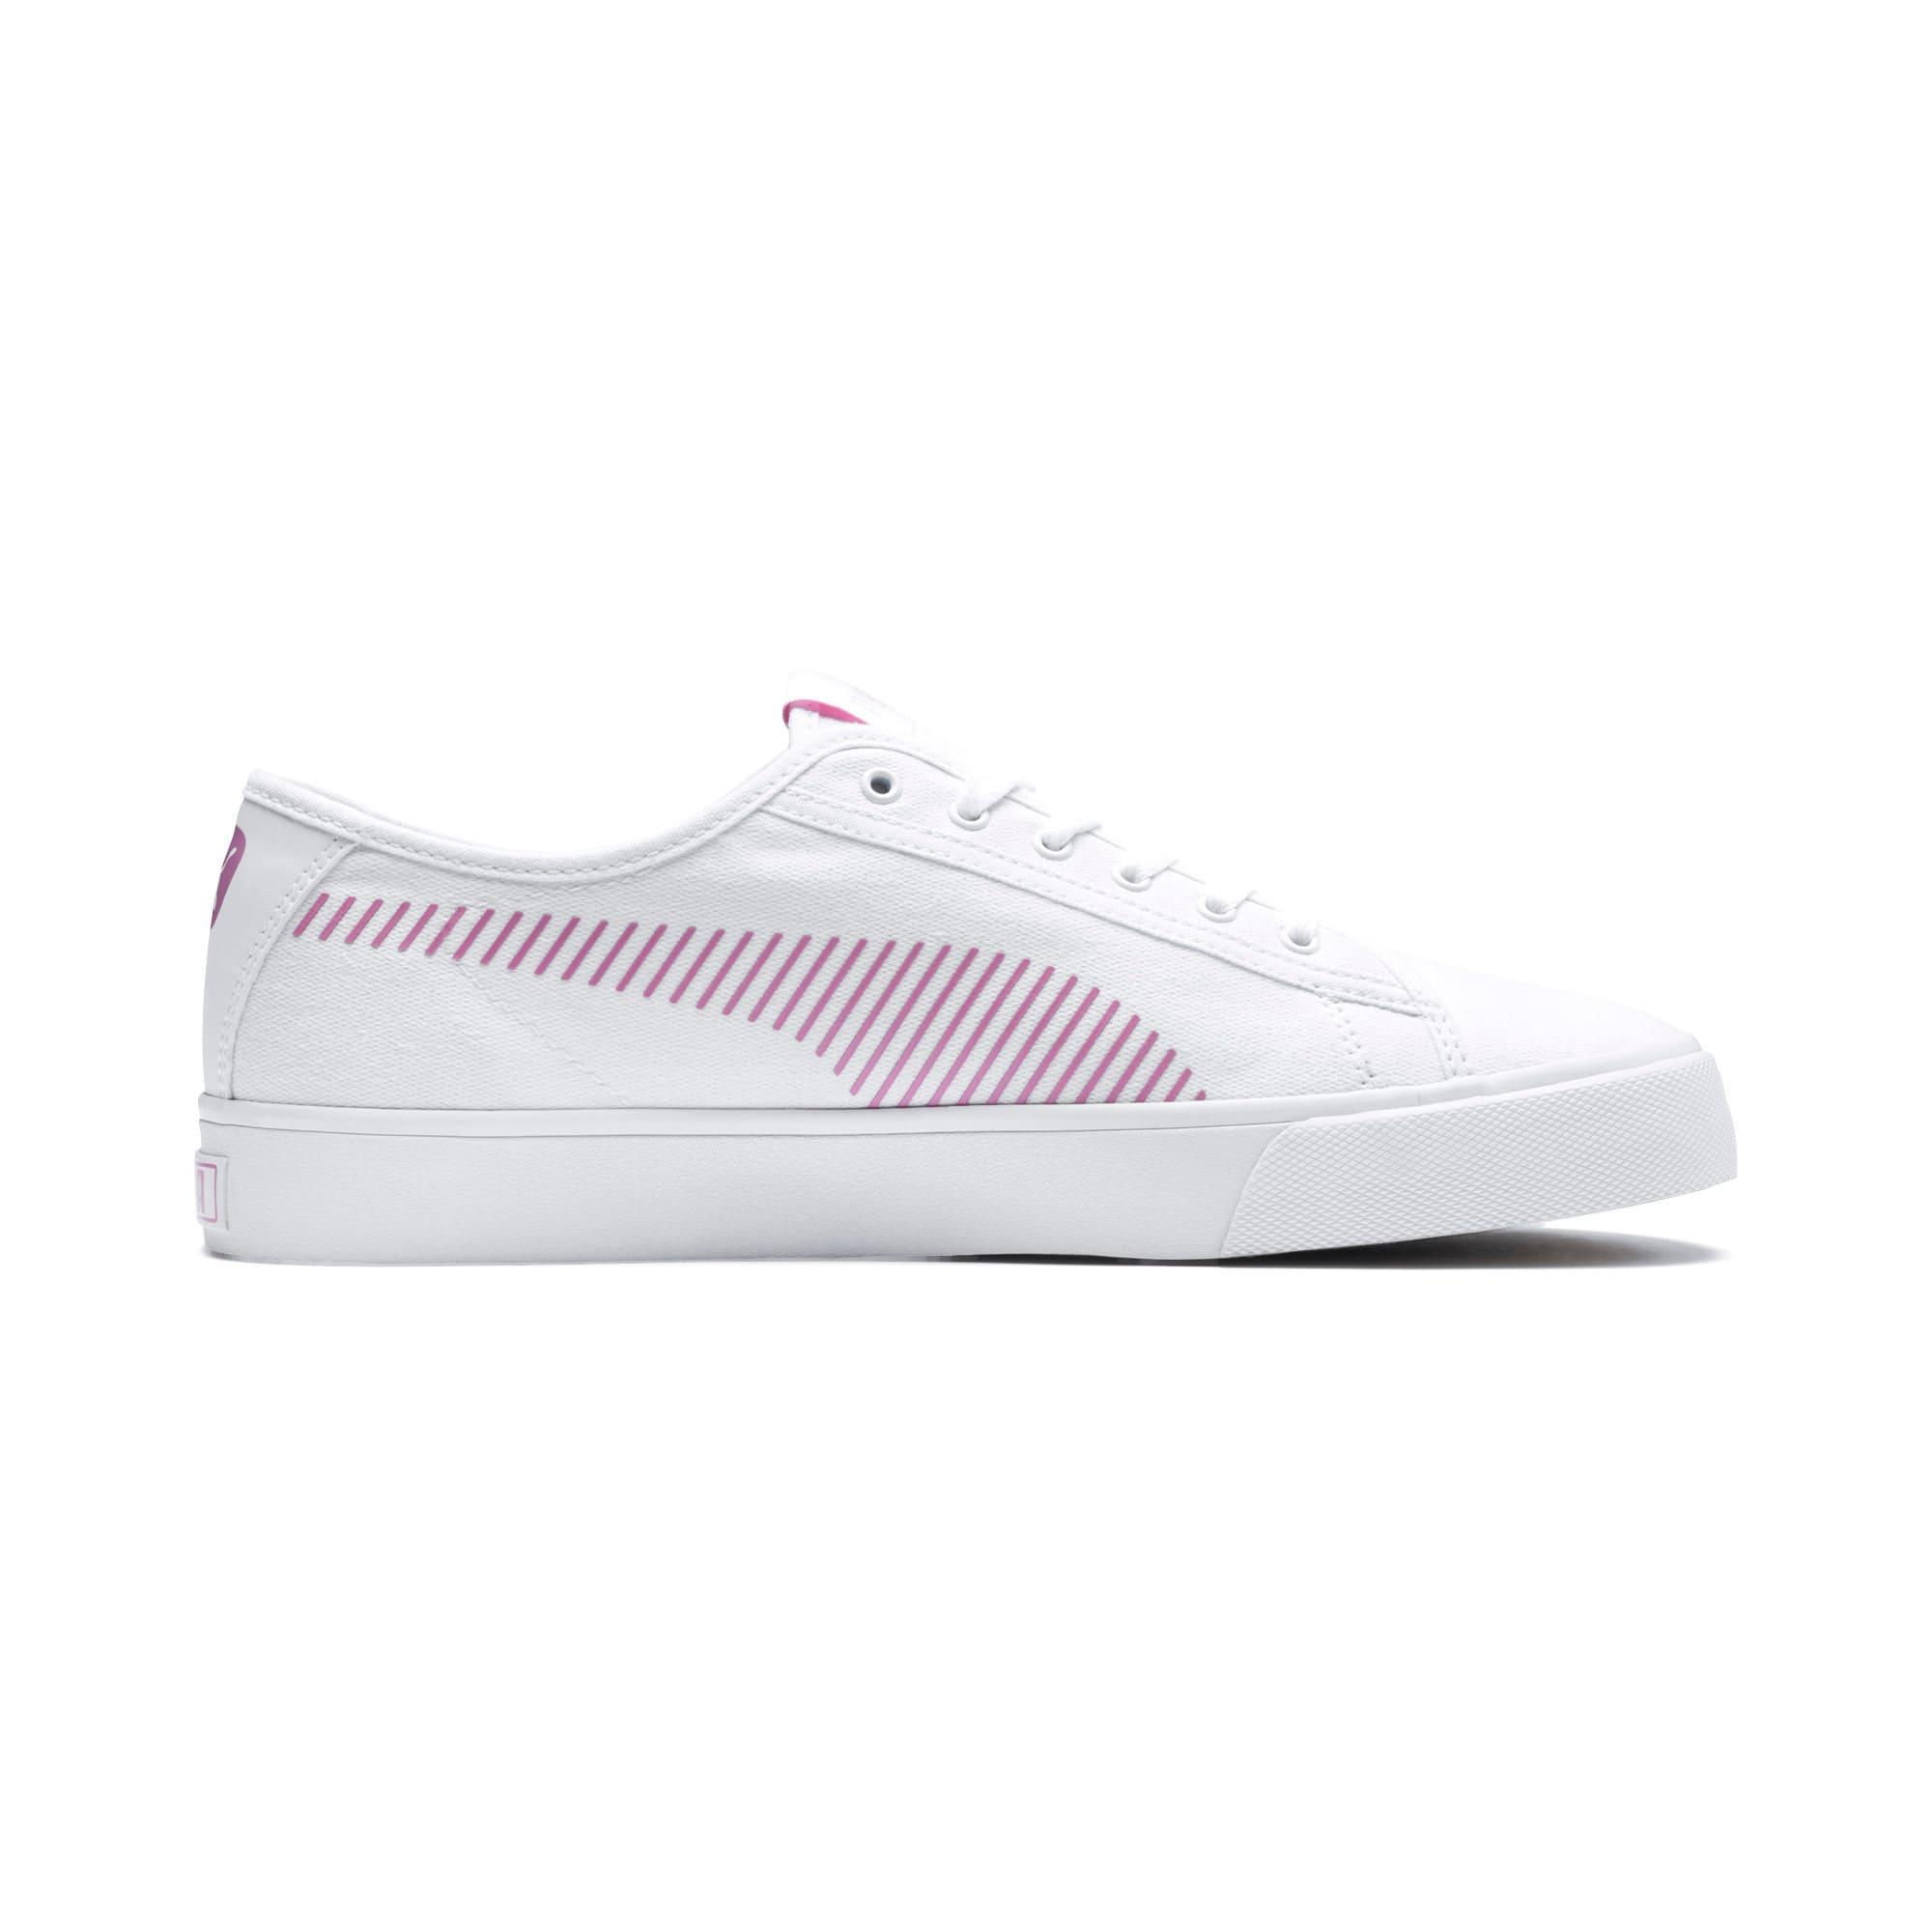 Thumbnail 5 of Bari Sneakers, Puma White-Pale Pink, medium